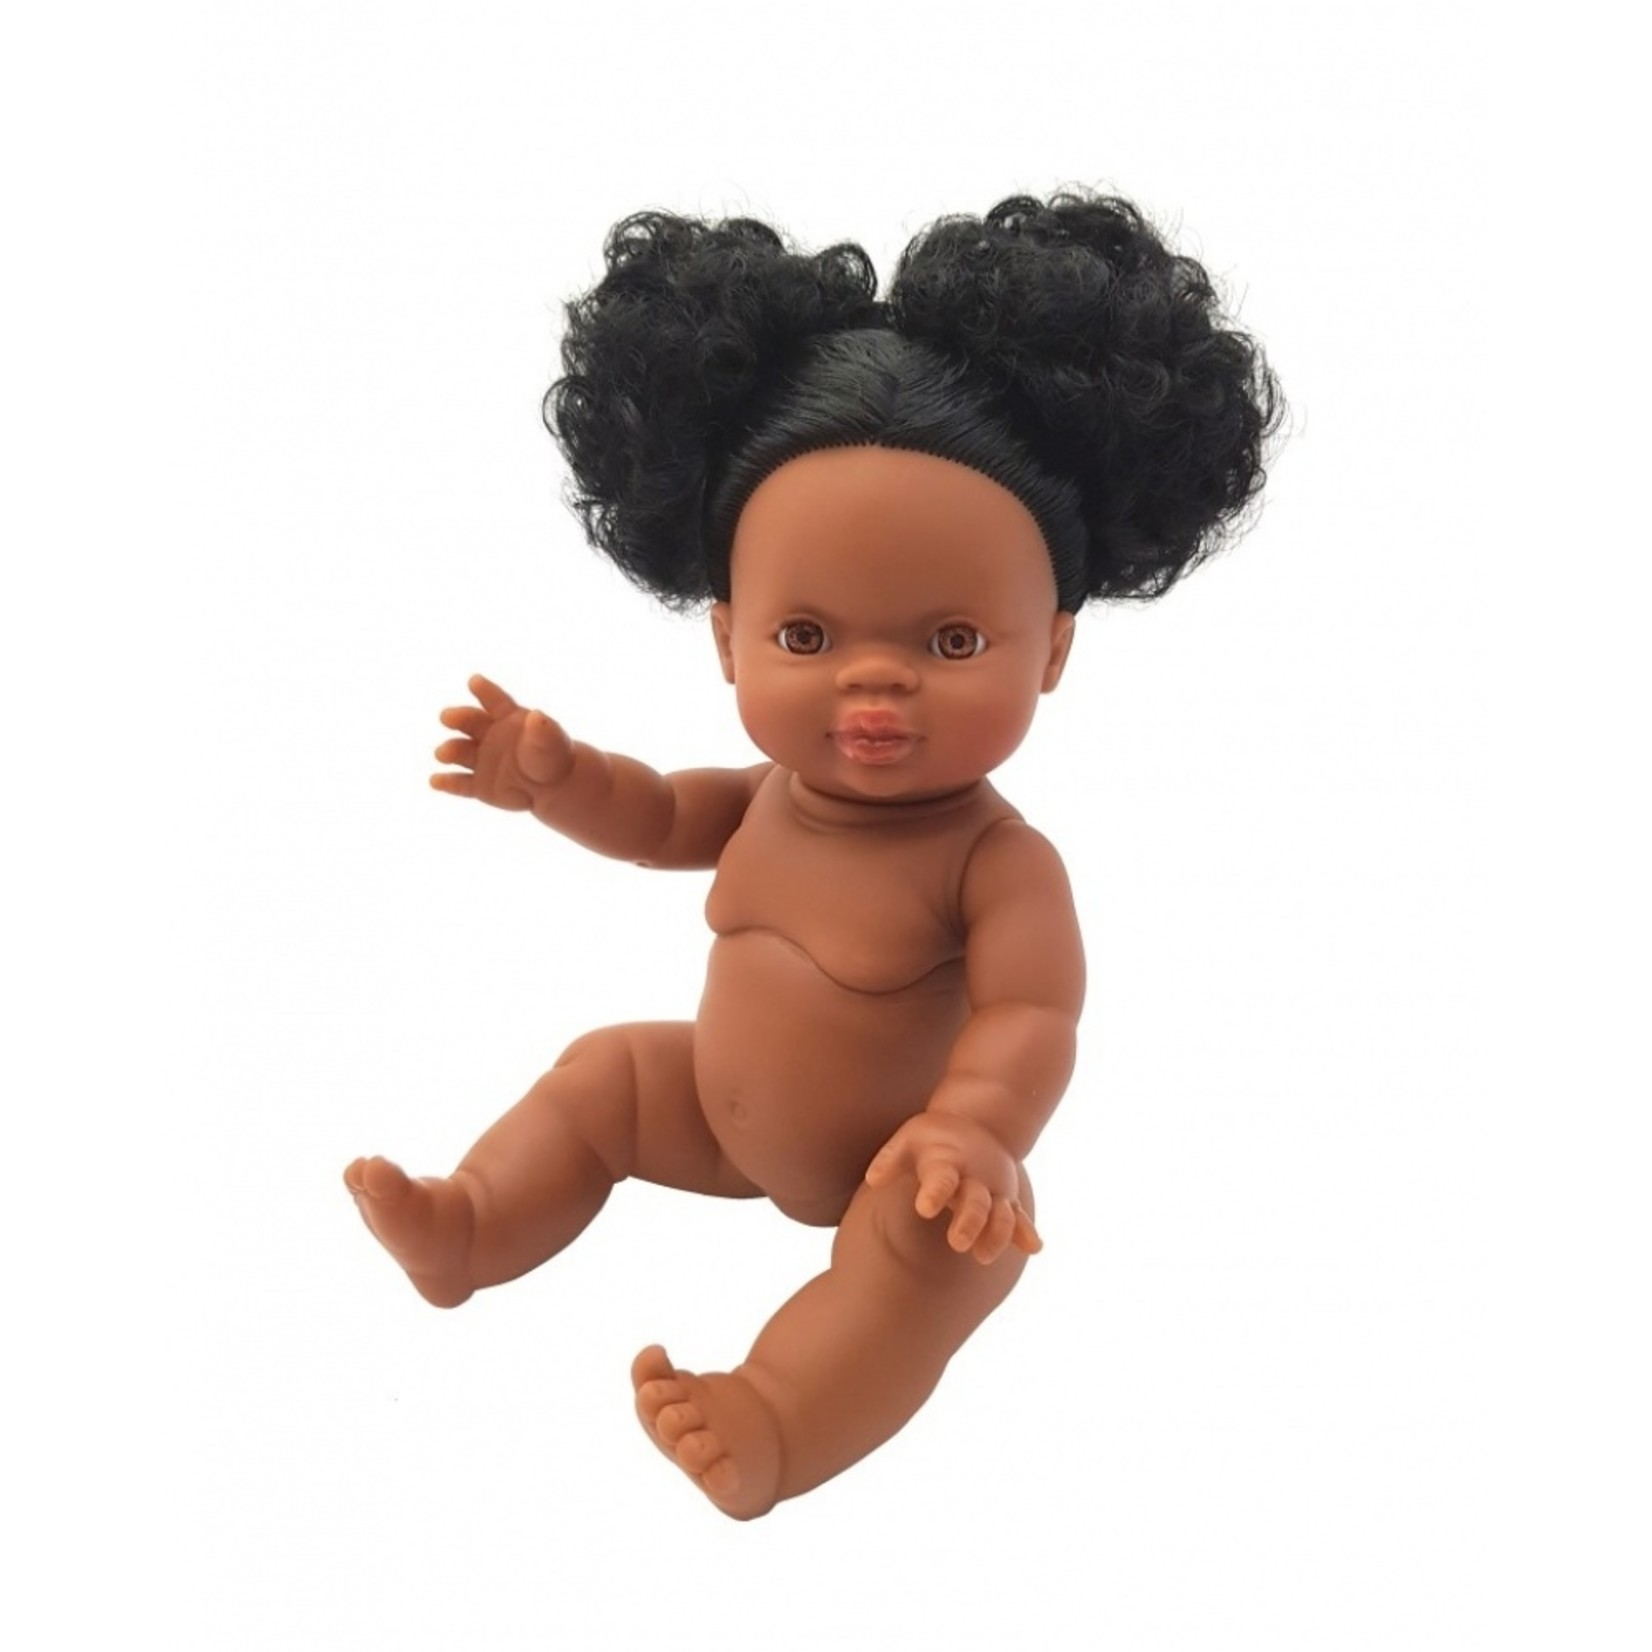 Gordi Babypop Meisje met donker haar